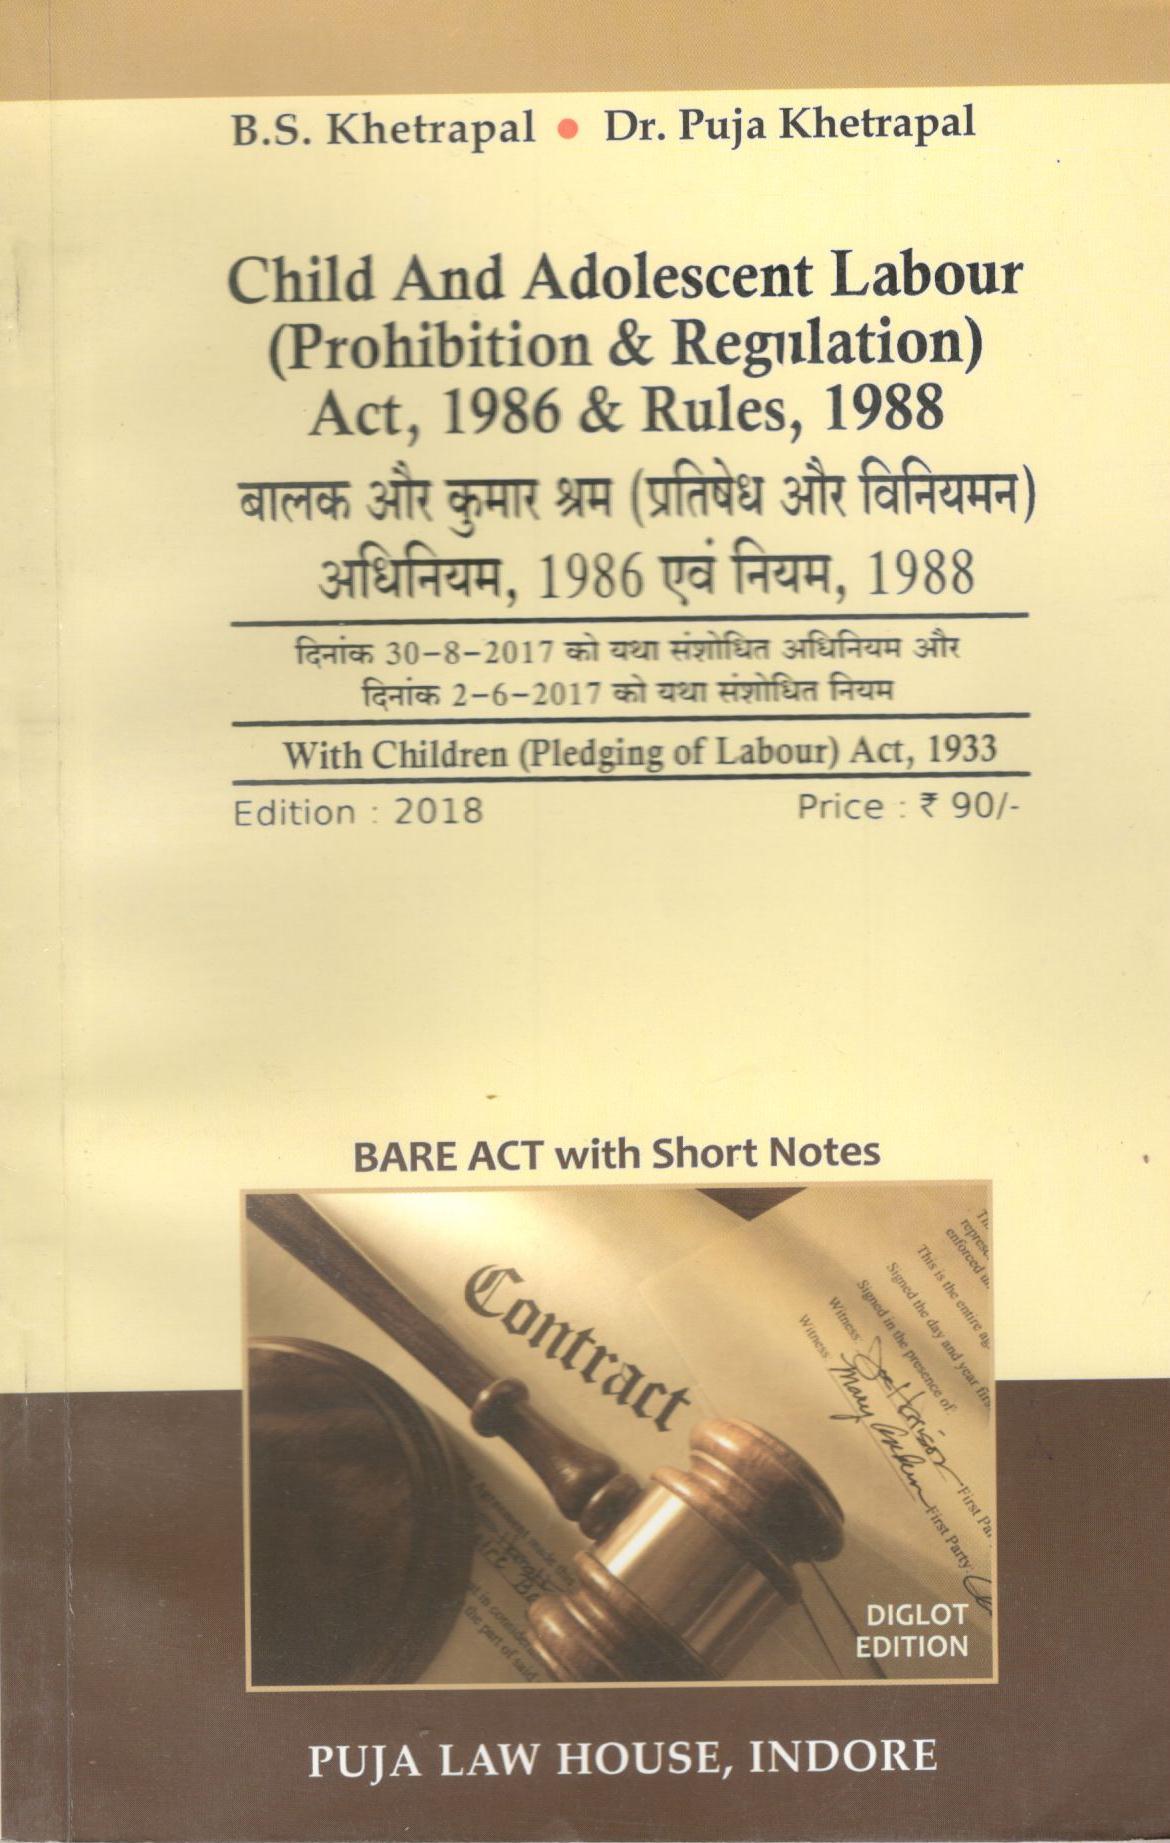 बालक और क�मार श�रम (प�रतिषेध और विनियमन) अधिनियम, 1986 �वं नियम, 1988 / Child and Adolescent Labour (Prohibition & Regulation) Act, 1986 & Rules, 1988